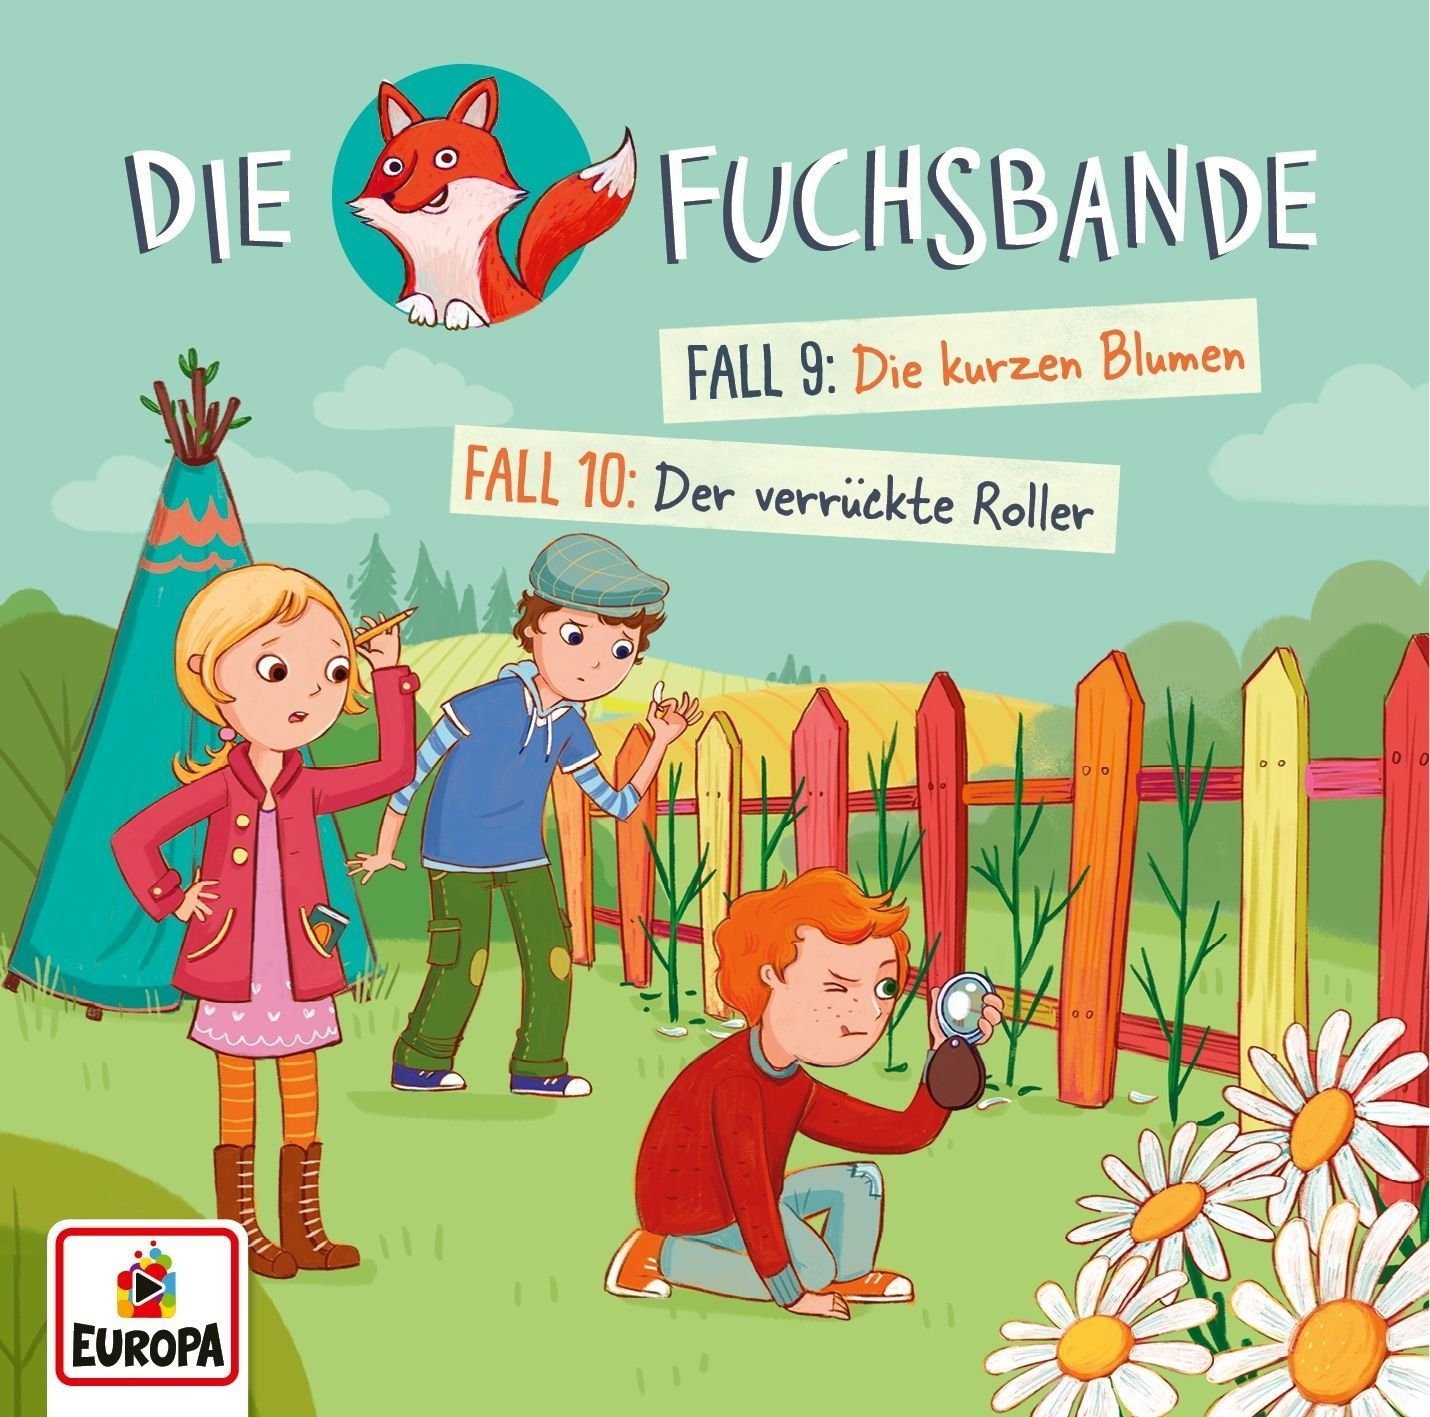 Die Fuchsbande - Folge 5: Fall 9: Die kurzen Blumen / Fall 10: Der verrückte Roller